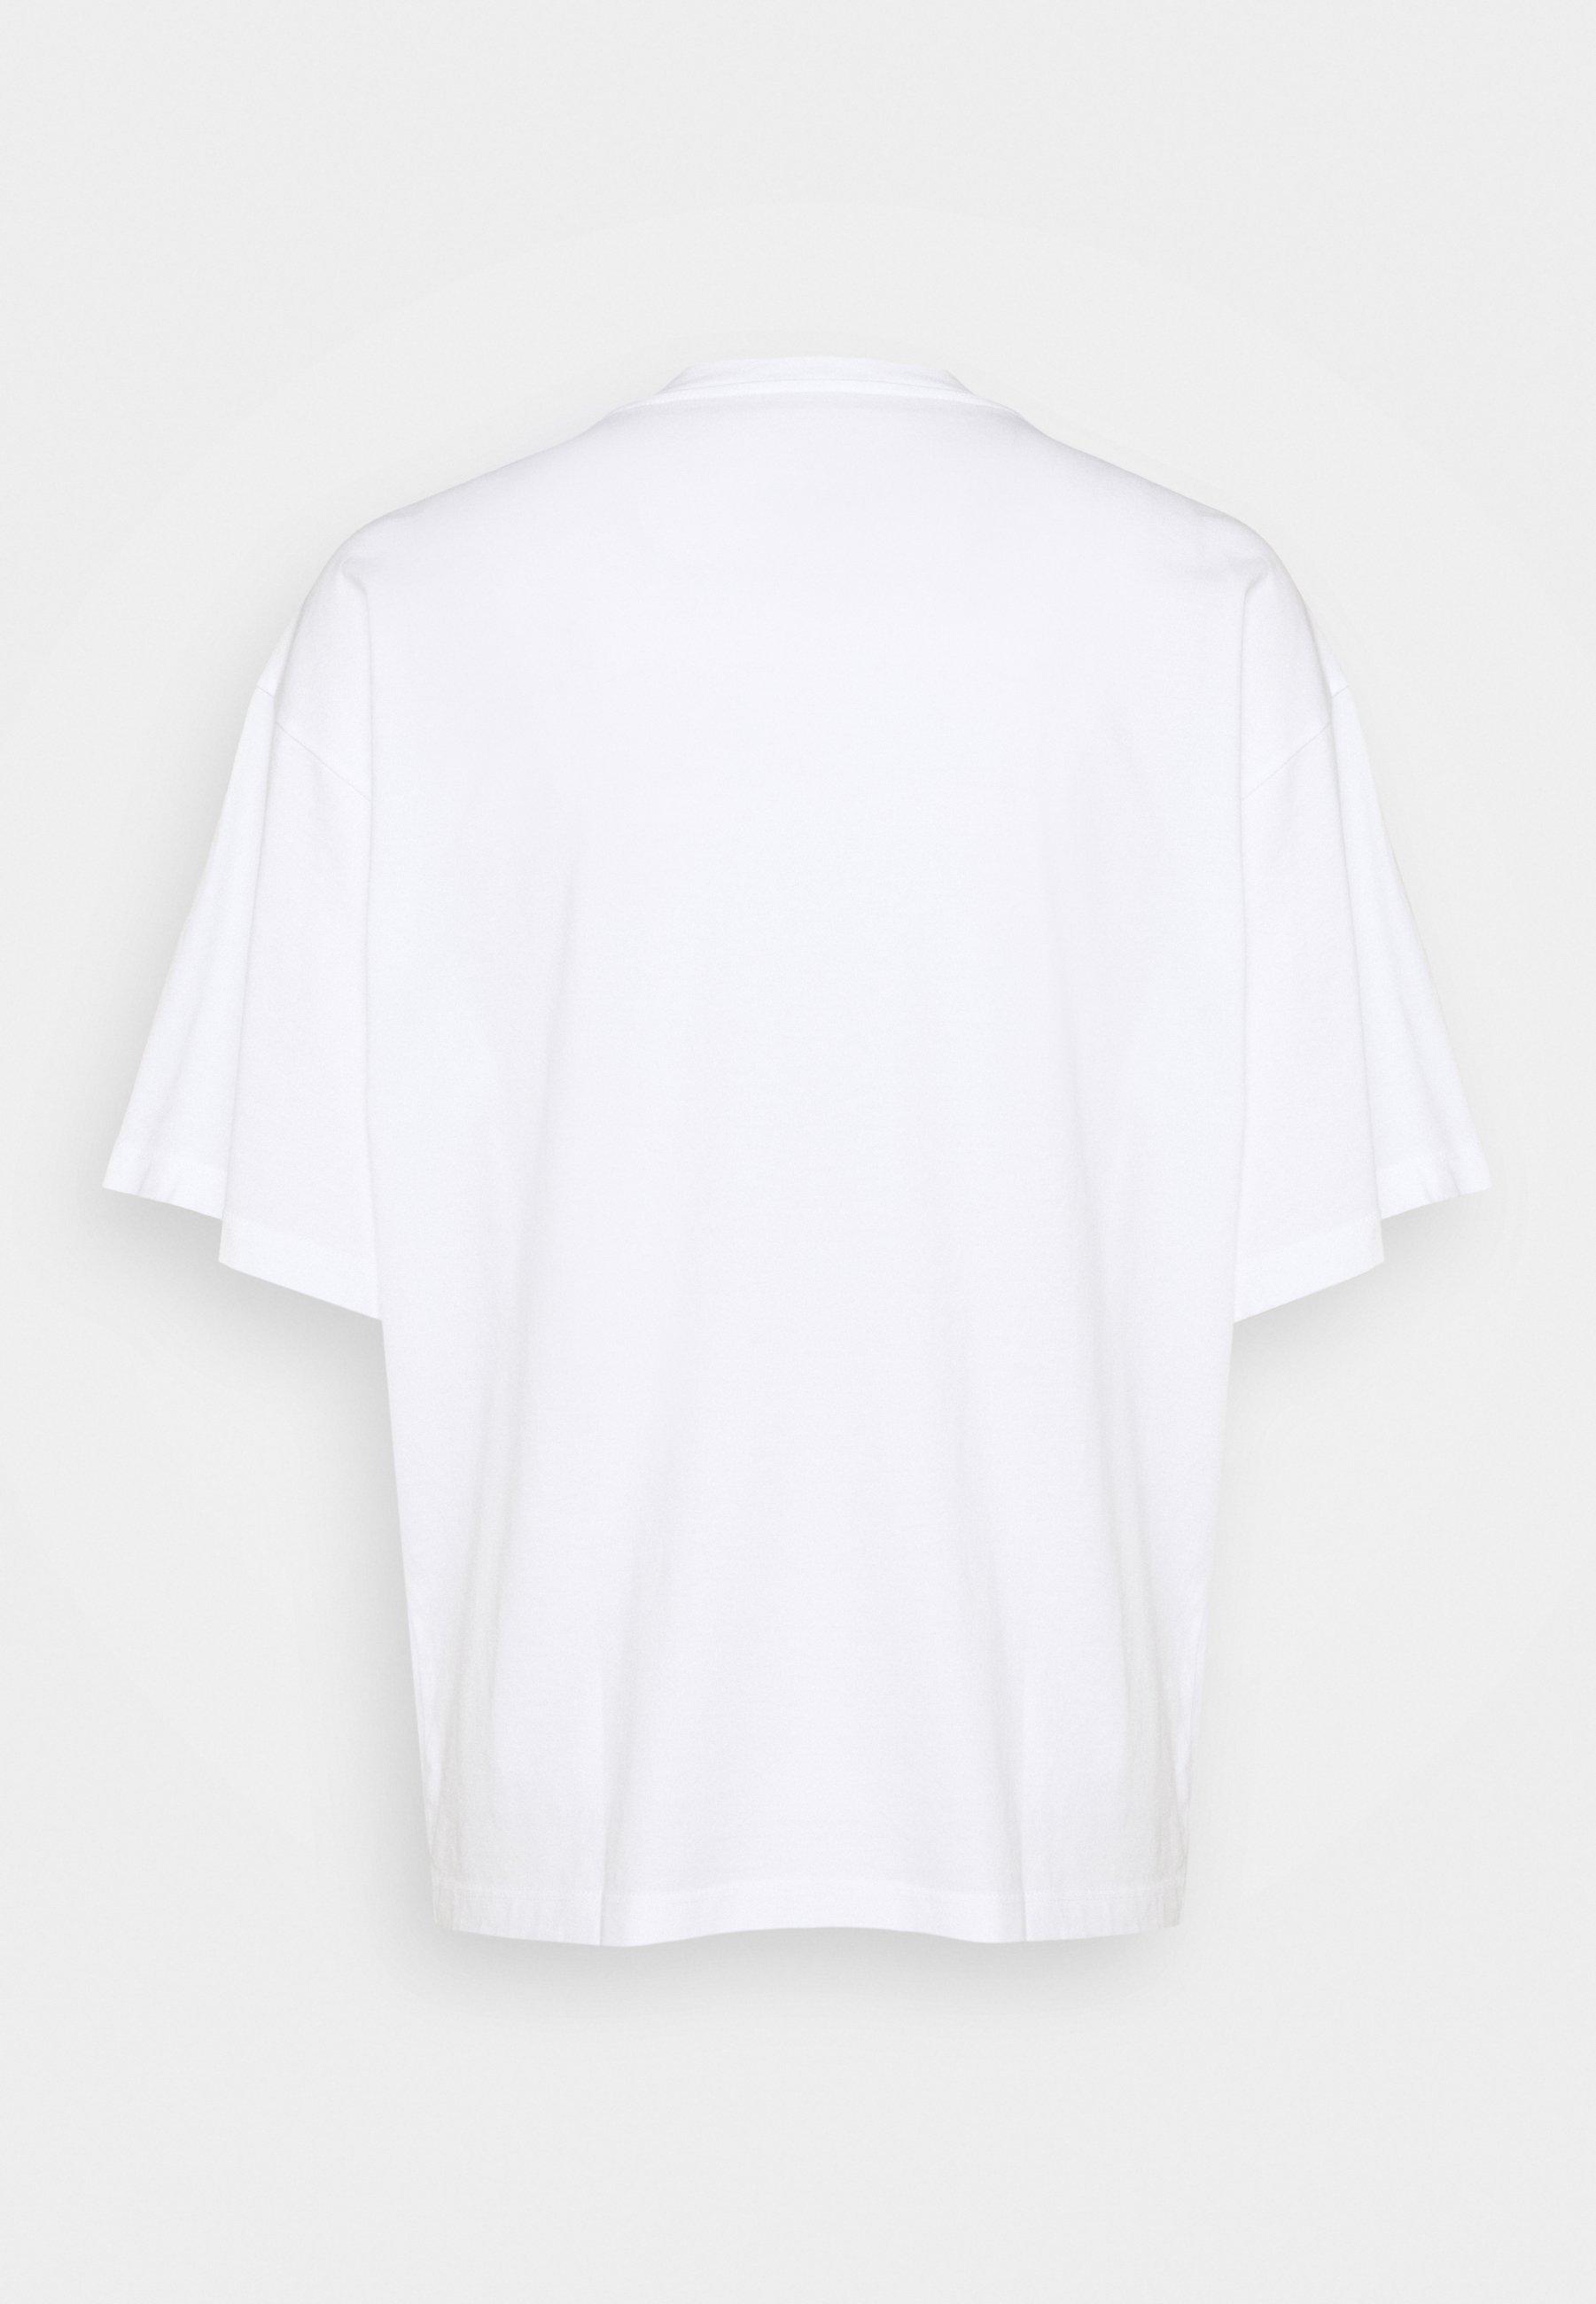 Mm6 Maison Margiela T-shirts Med Print - White/hvit